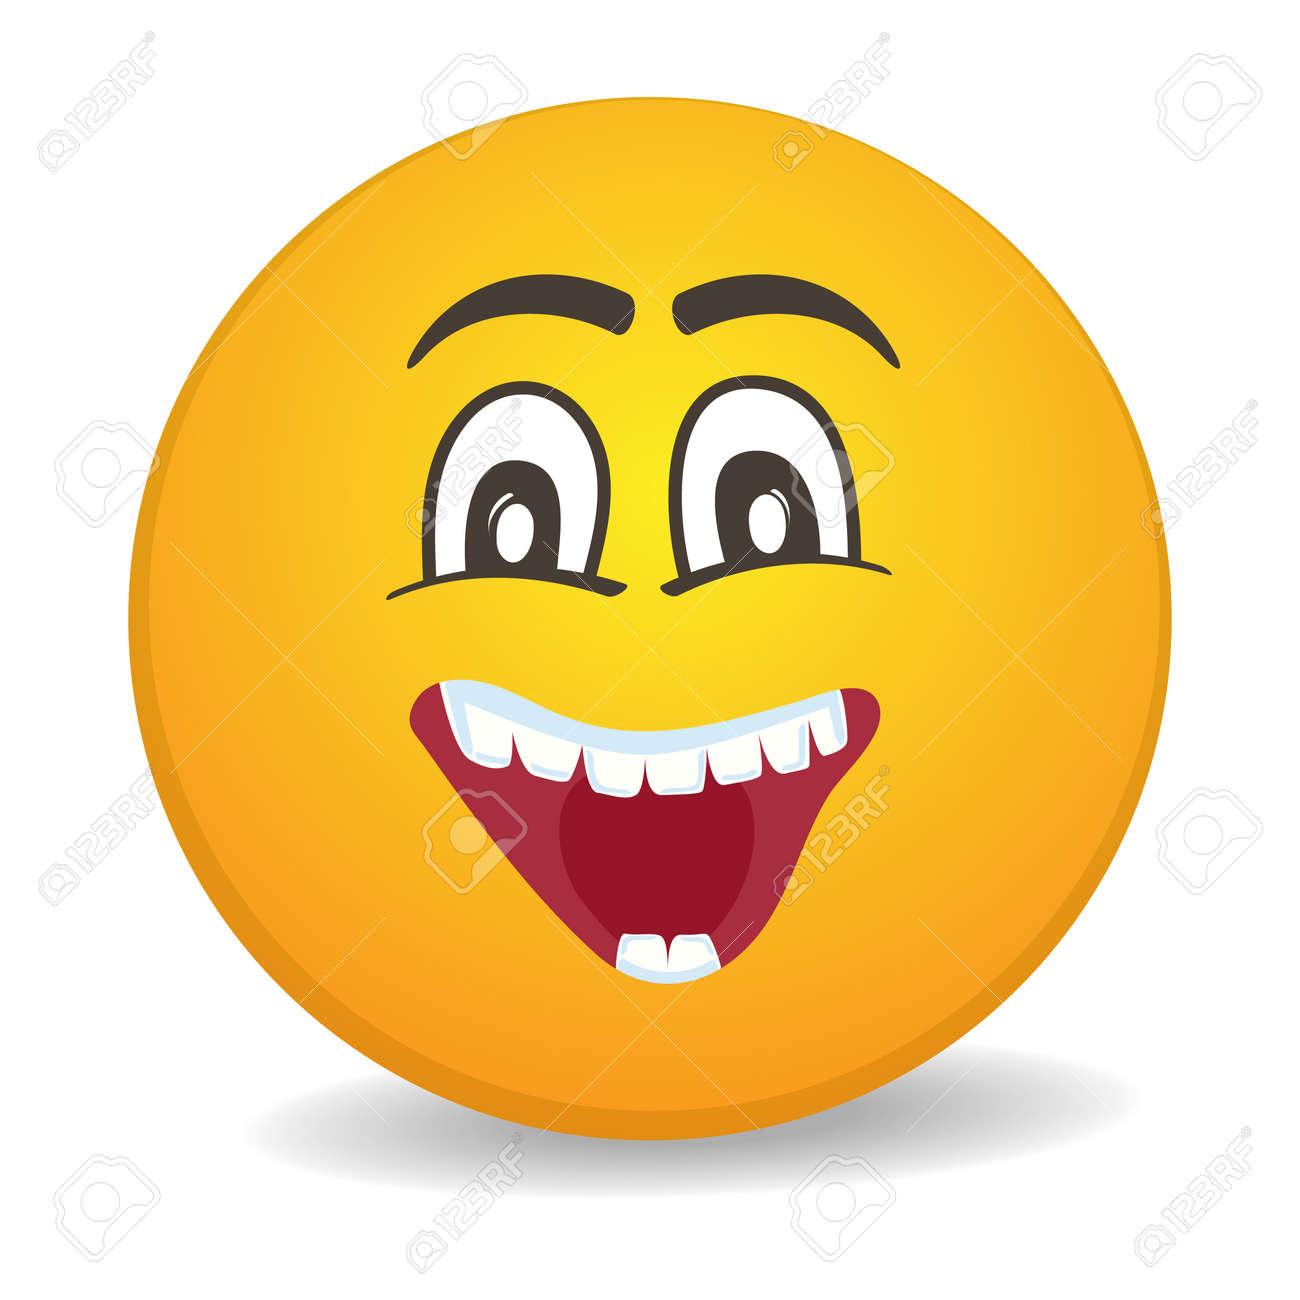 happy 3d round yellow smiley face vector icon. funny facial